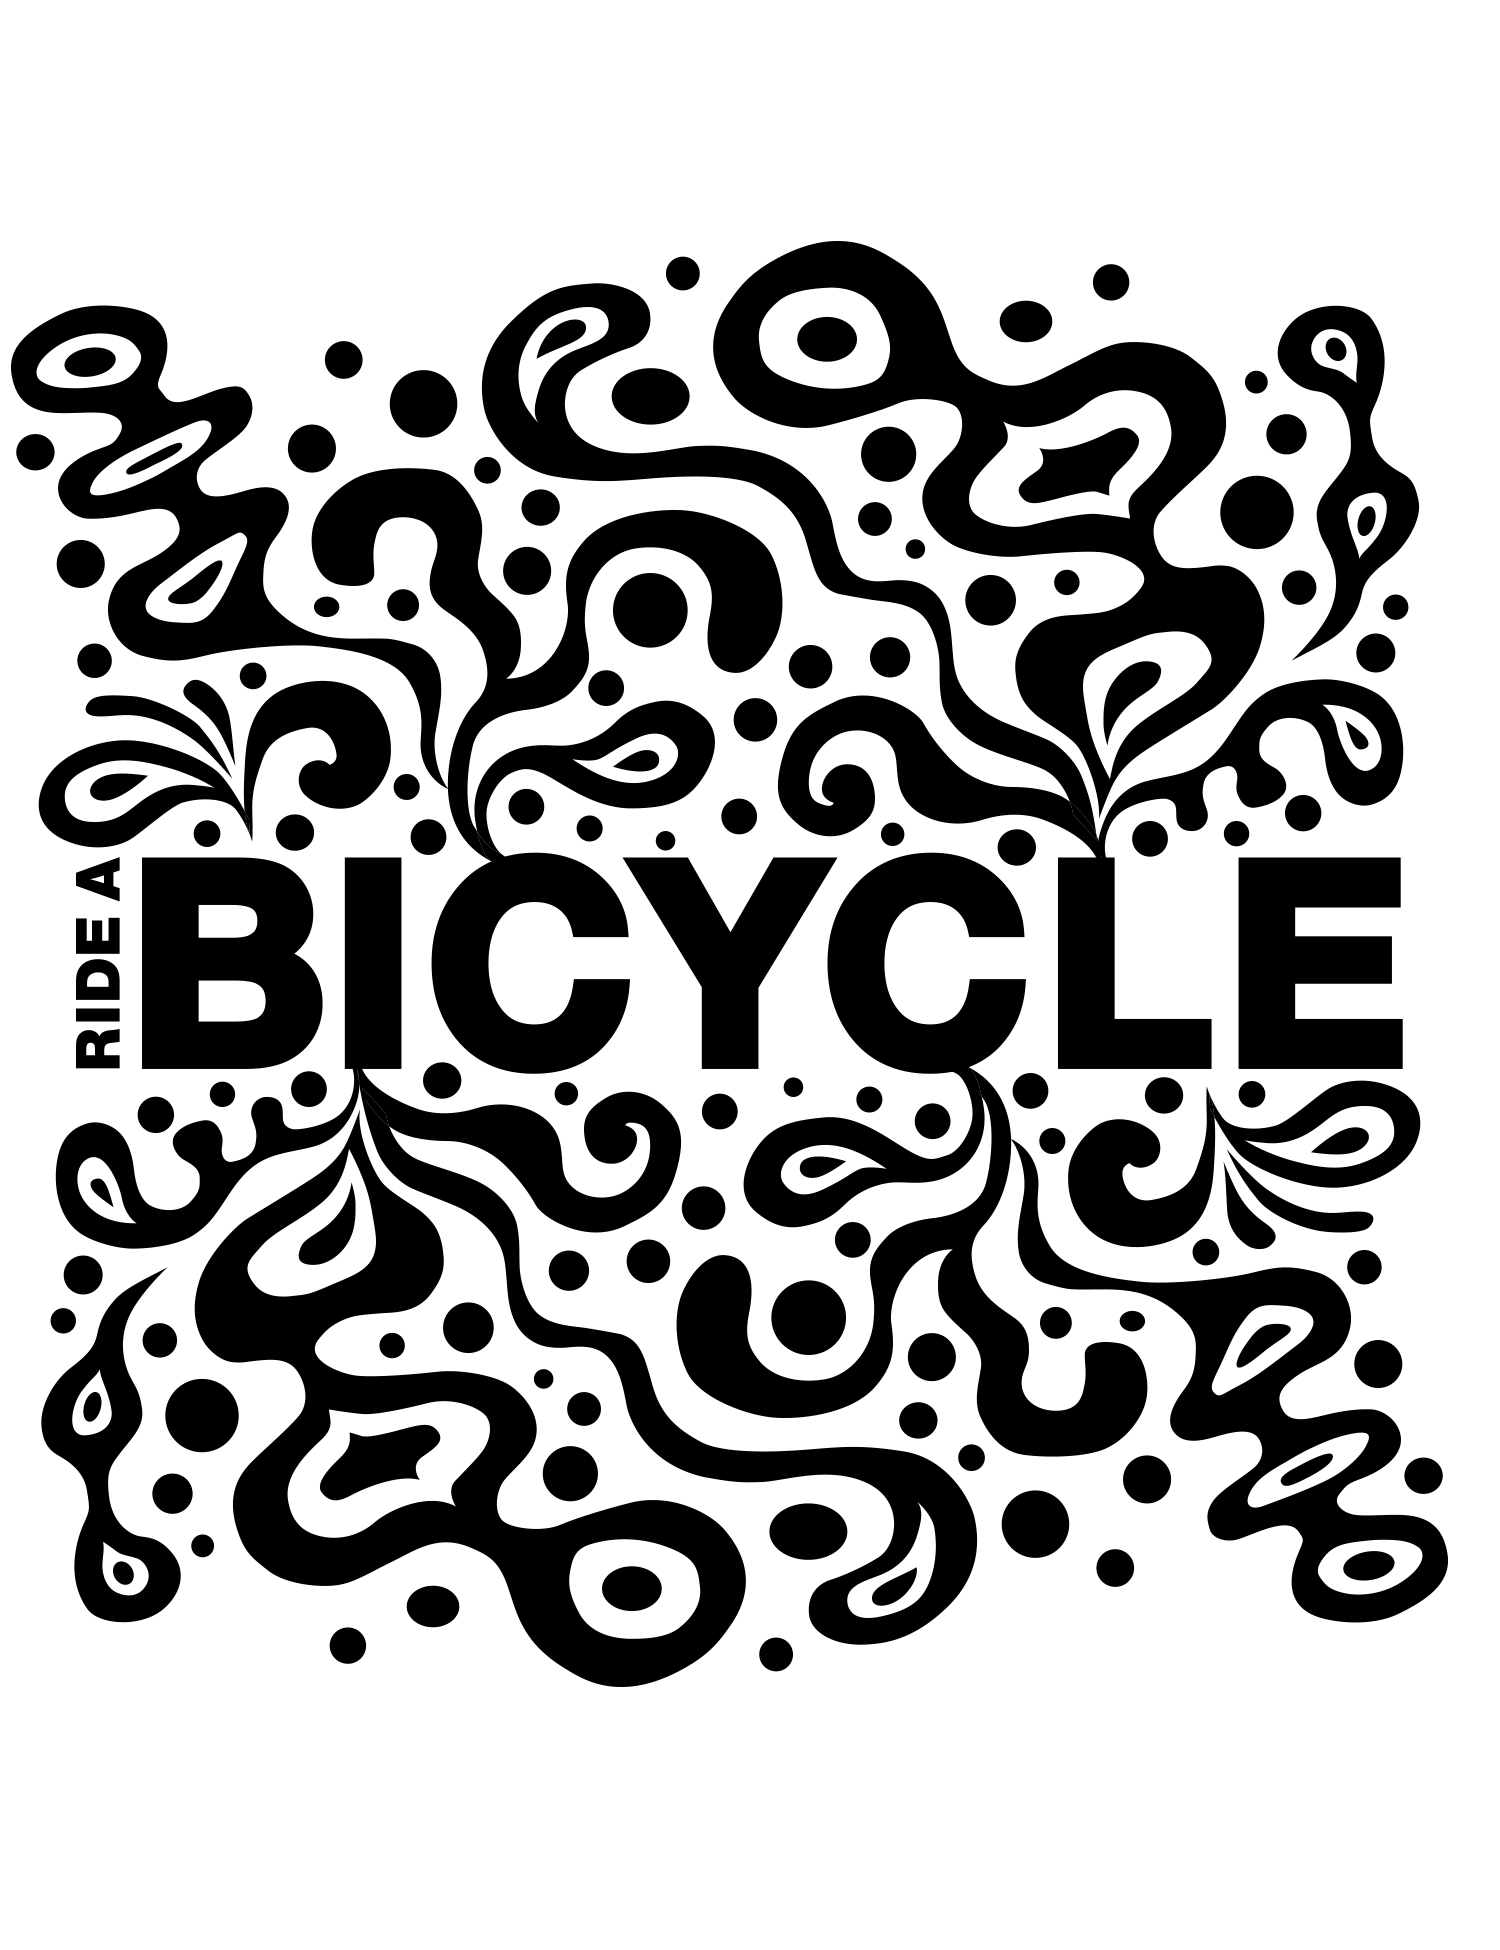 ride_a_bicycle_type_pattern_andi_bird.png